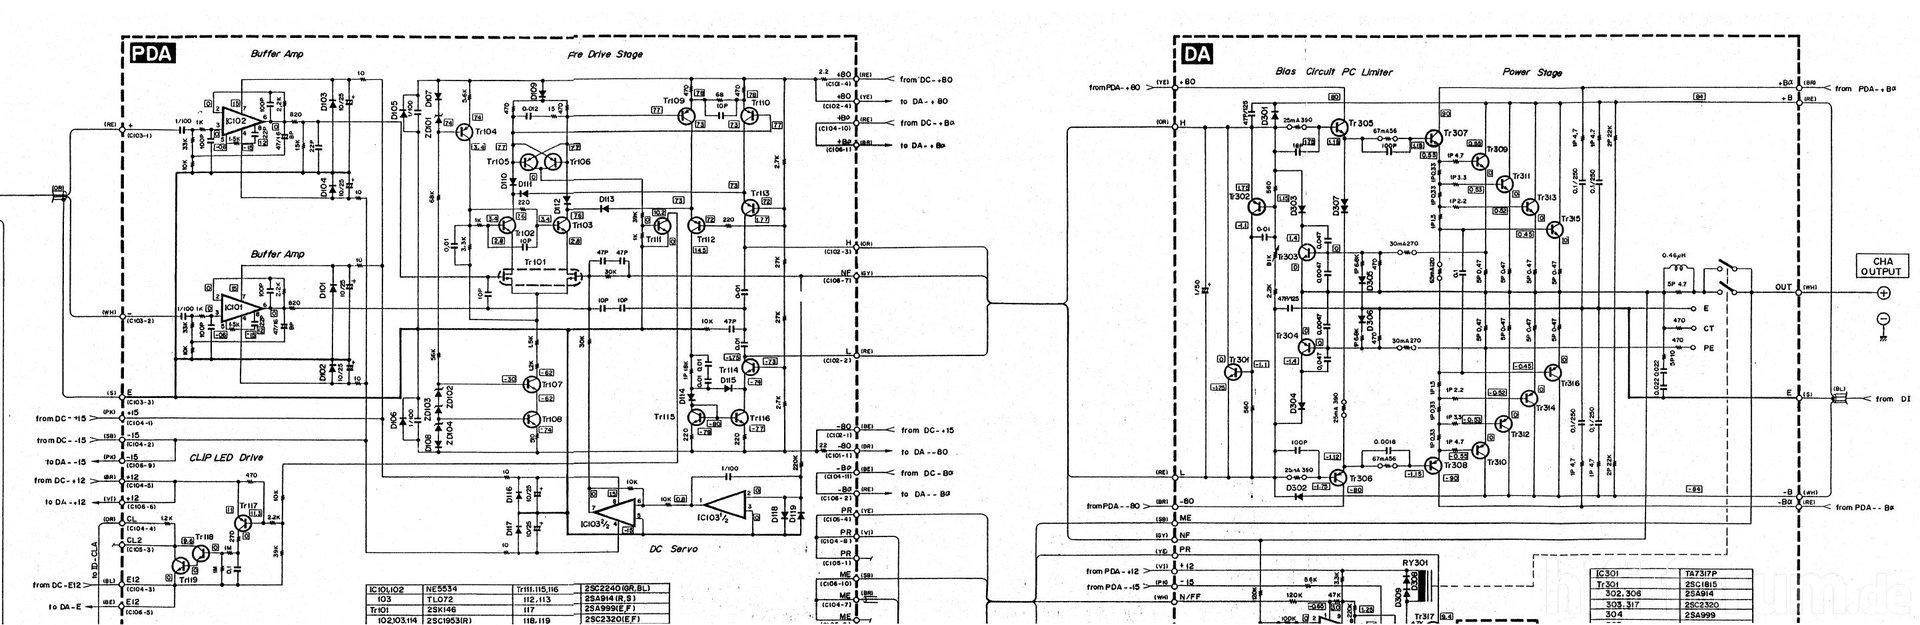 Yamaha Amp Schematic - 15.gt.capecoral-bootsvermietung.de •